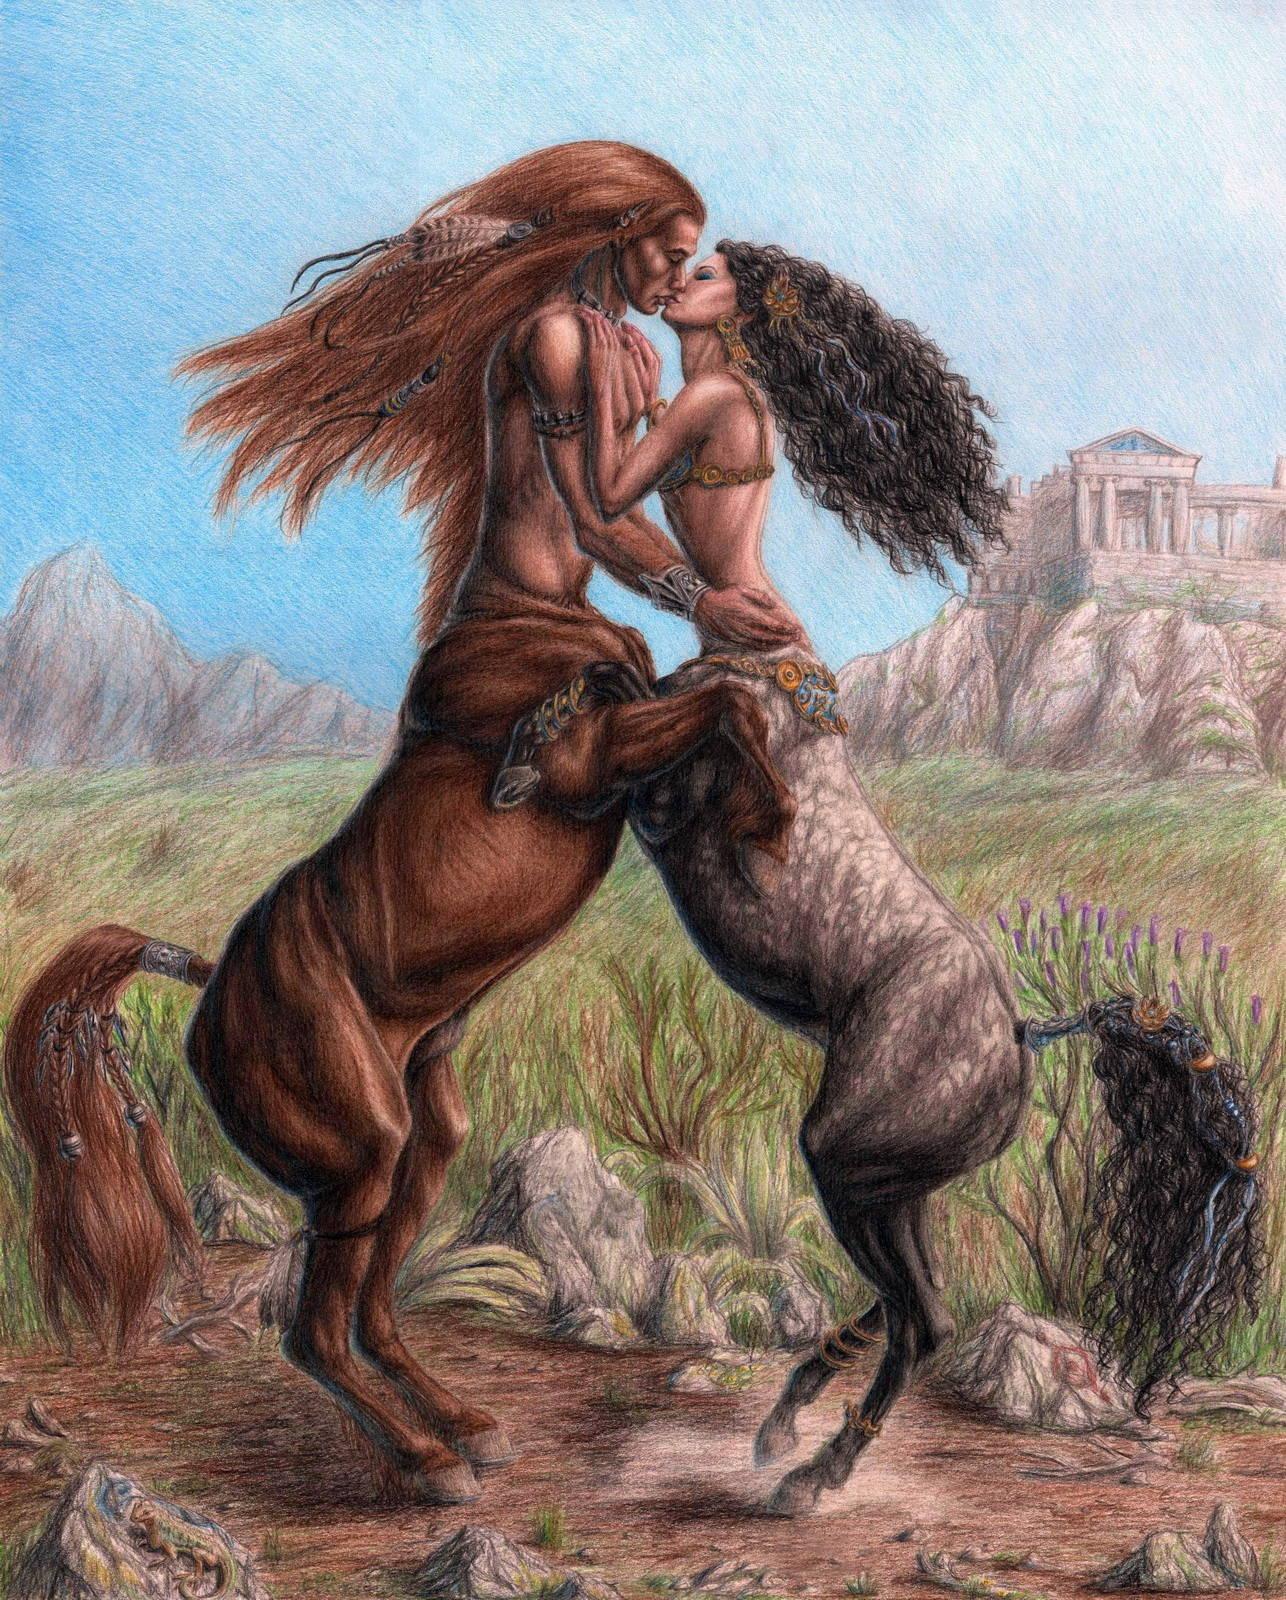 Gay centaur hardcore scenes